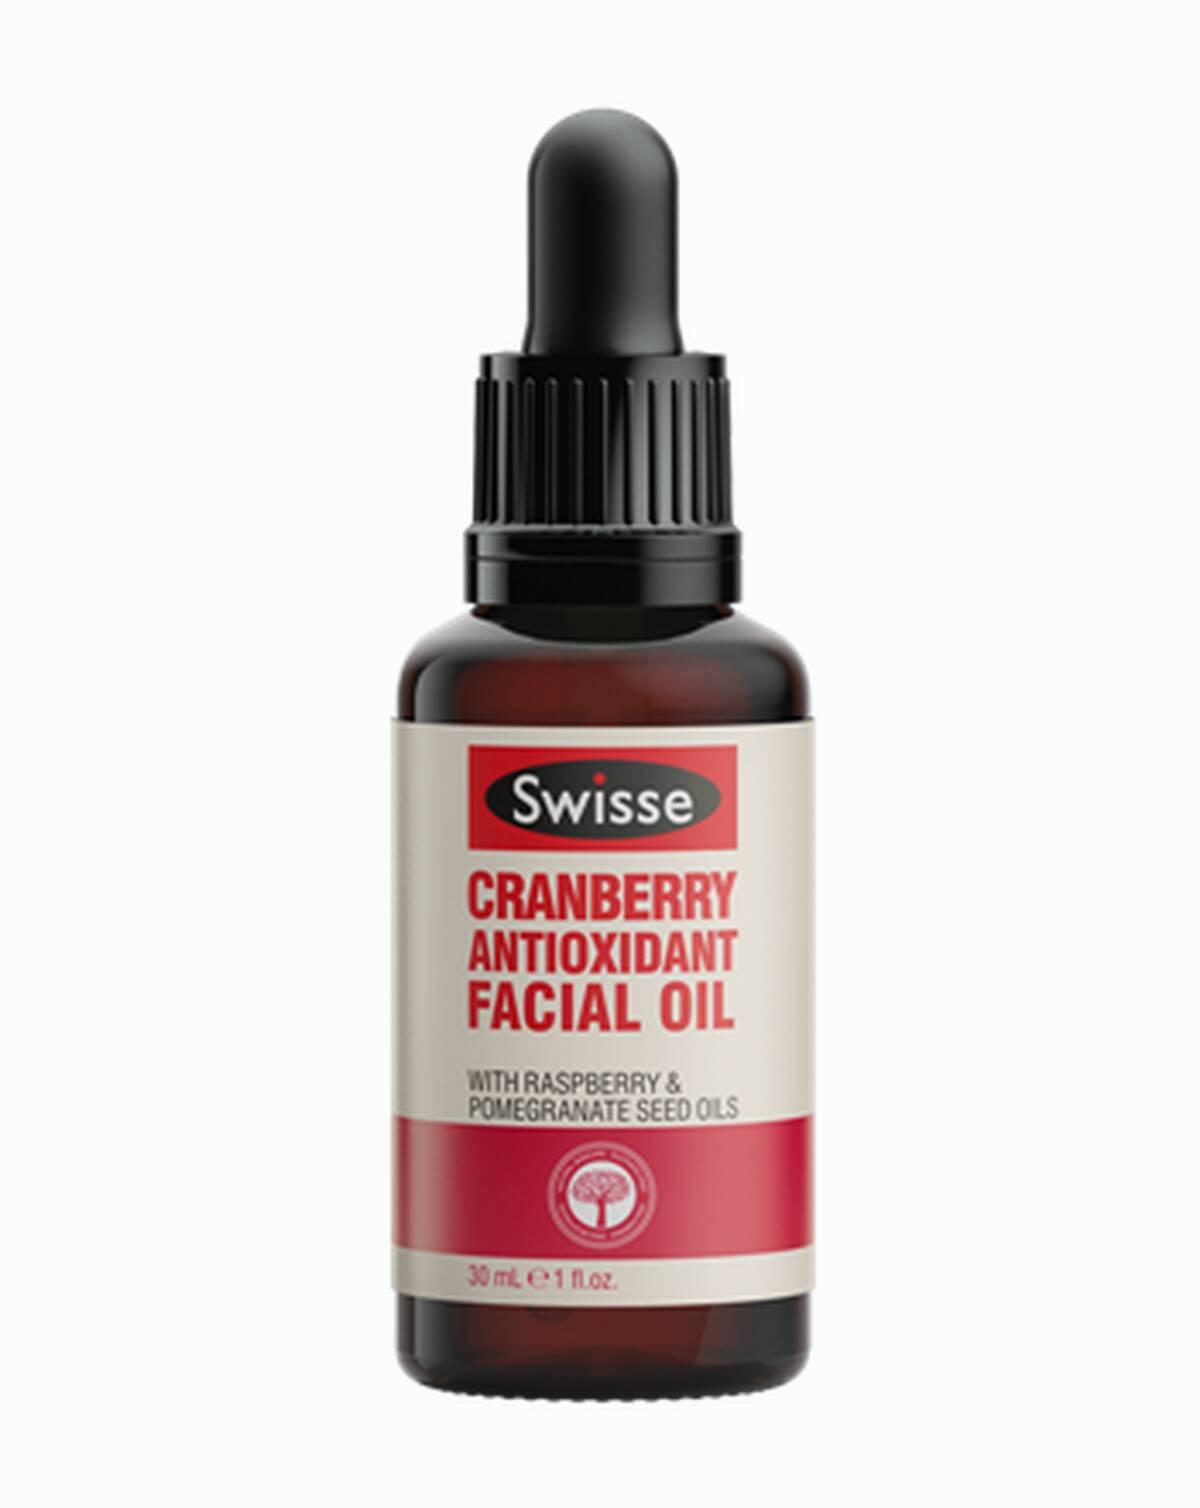 Swisse skincare oils Cranberry Antioxidant Oil dropper product shot